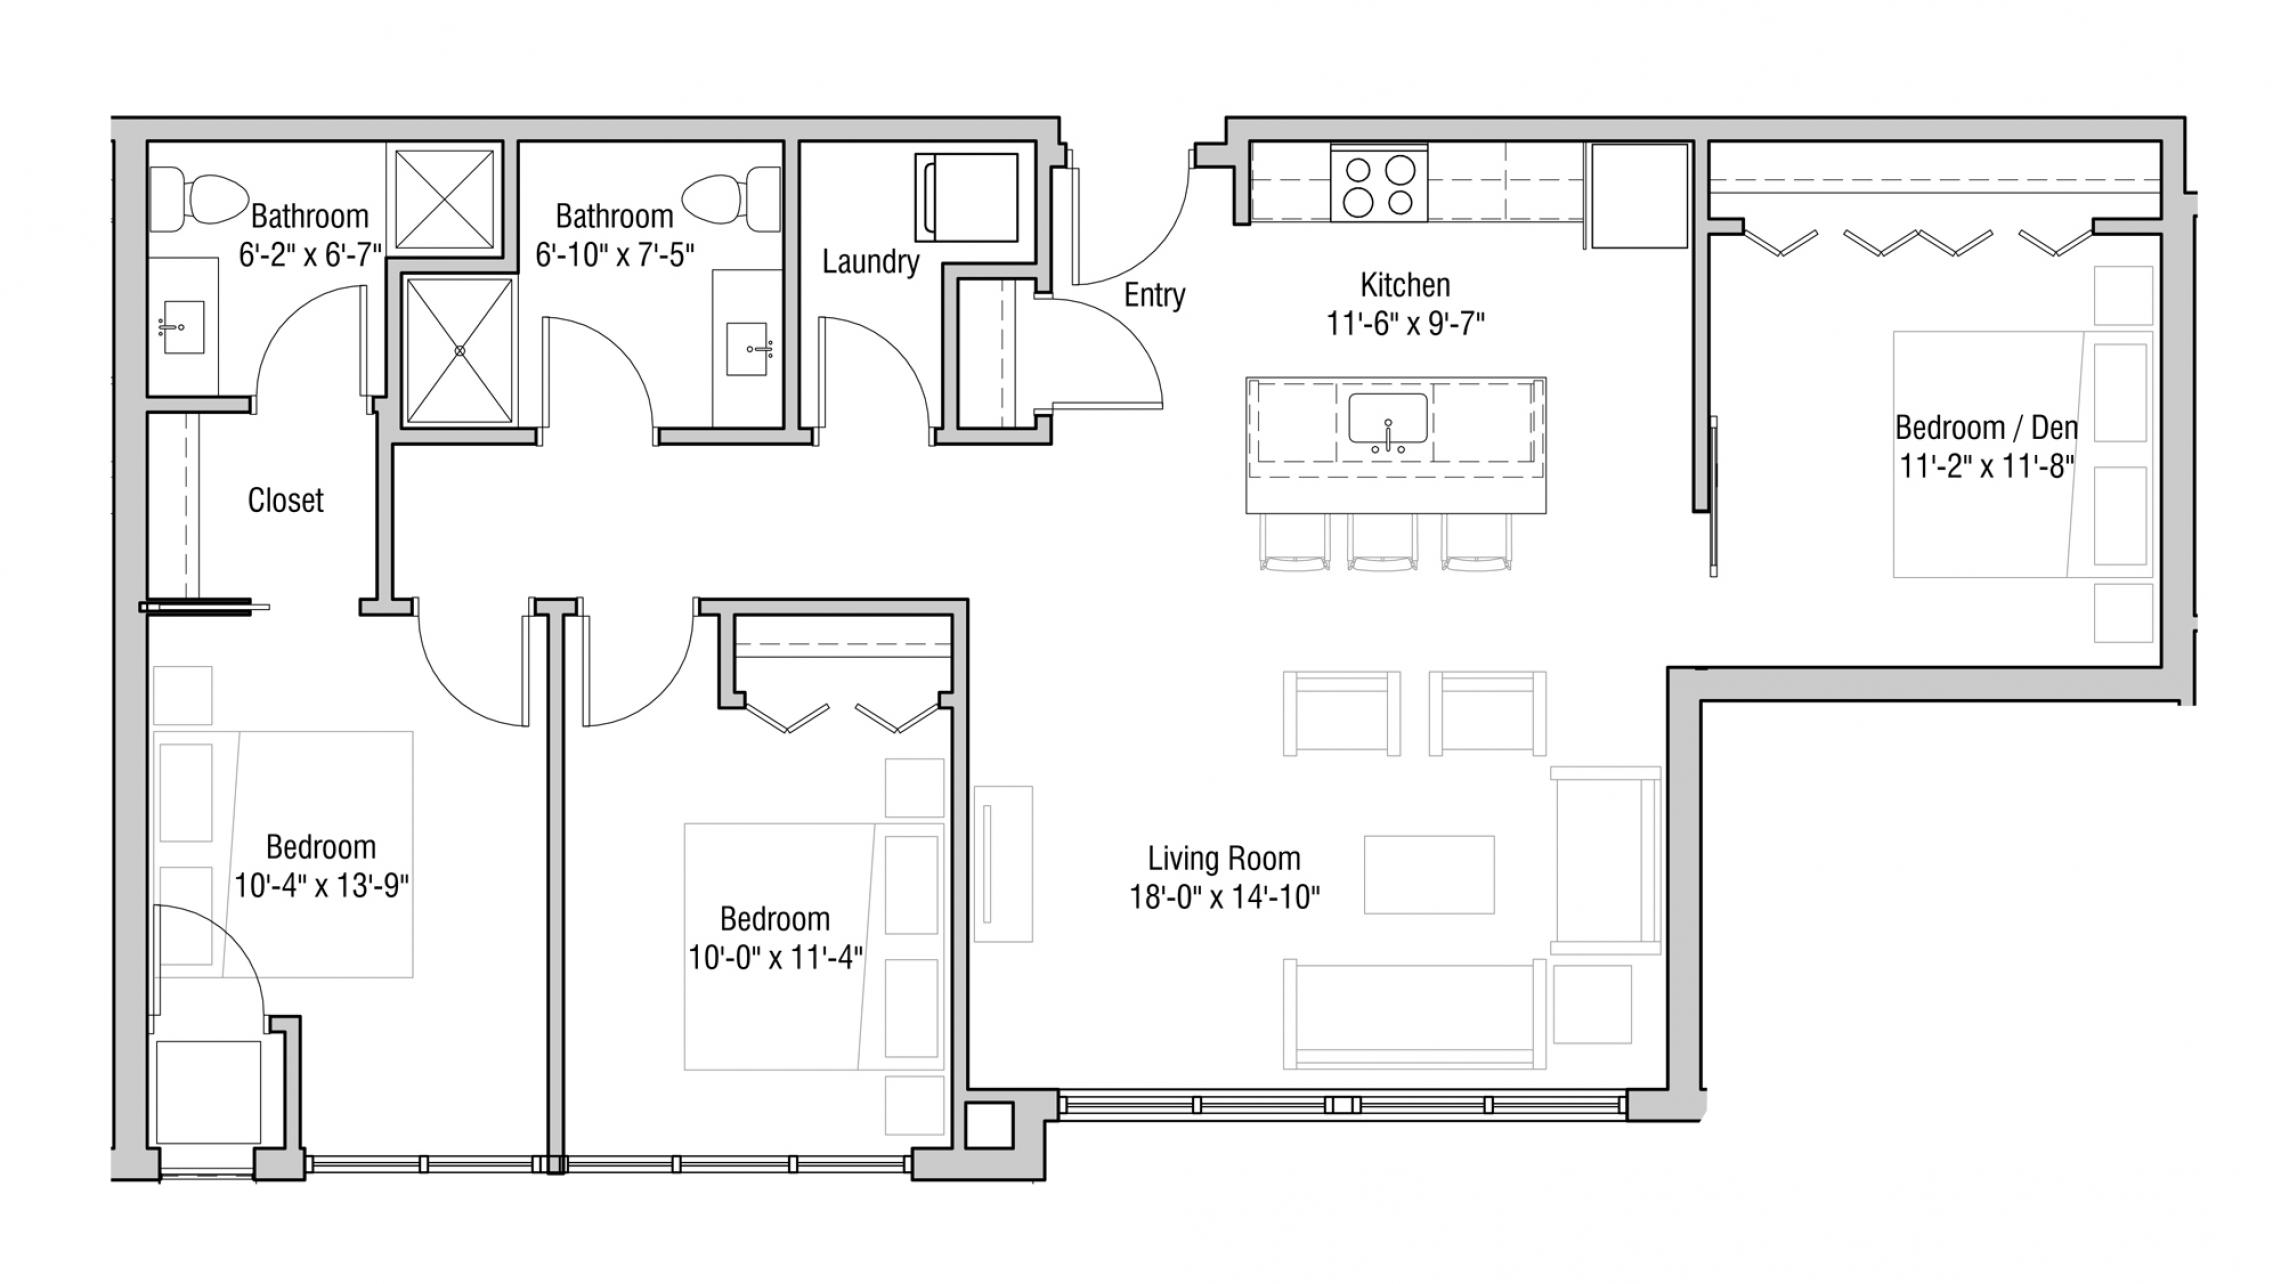 ULI Quarter Row 316 - Two Bedroom, Two Bathroom